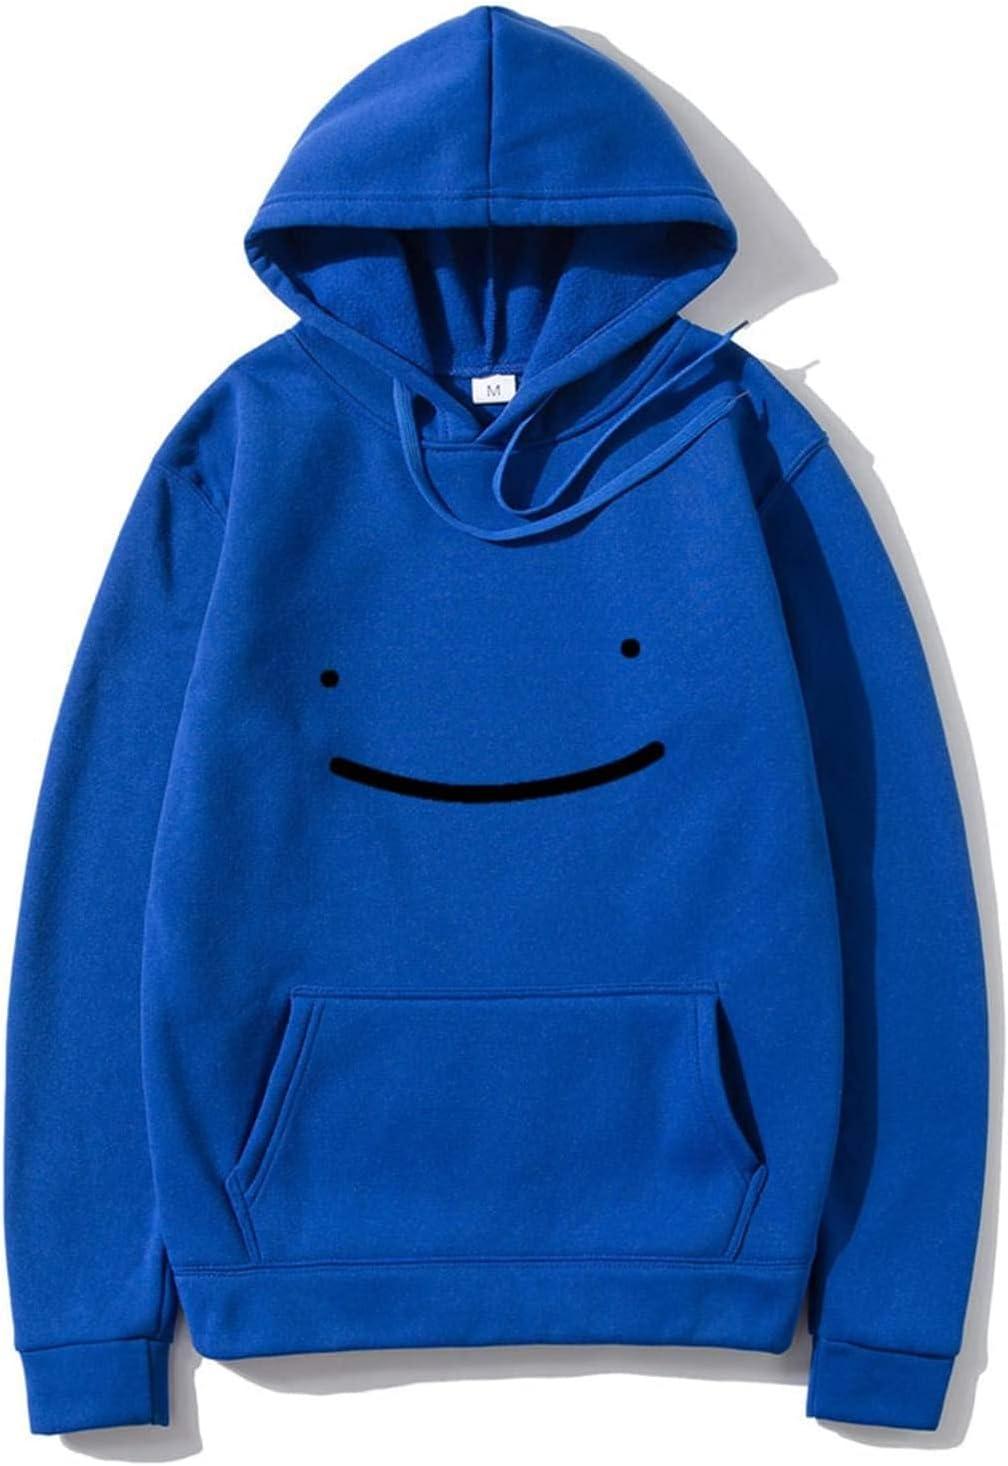 MAORR Cartoon Hooded Sweater, Moletom Com Capuz Moletom Masculino Feminino Harajuku Pullover Moletom Streetwear Moda Casual Roupas Grandes (Color : 17, Size : -M)